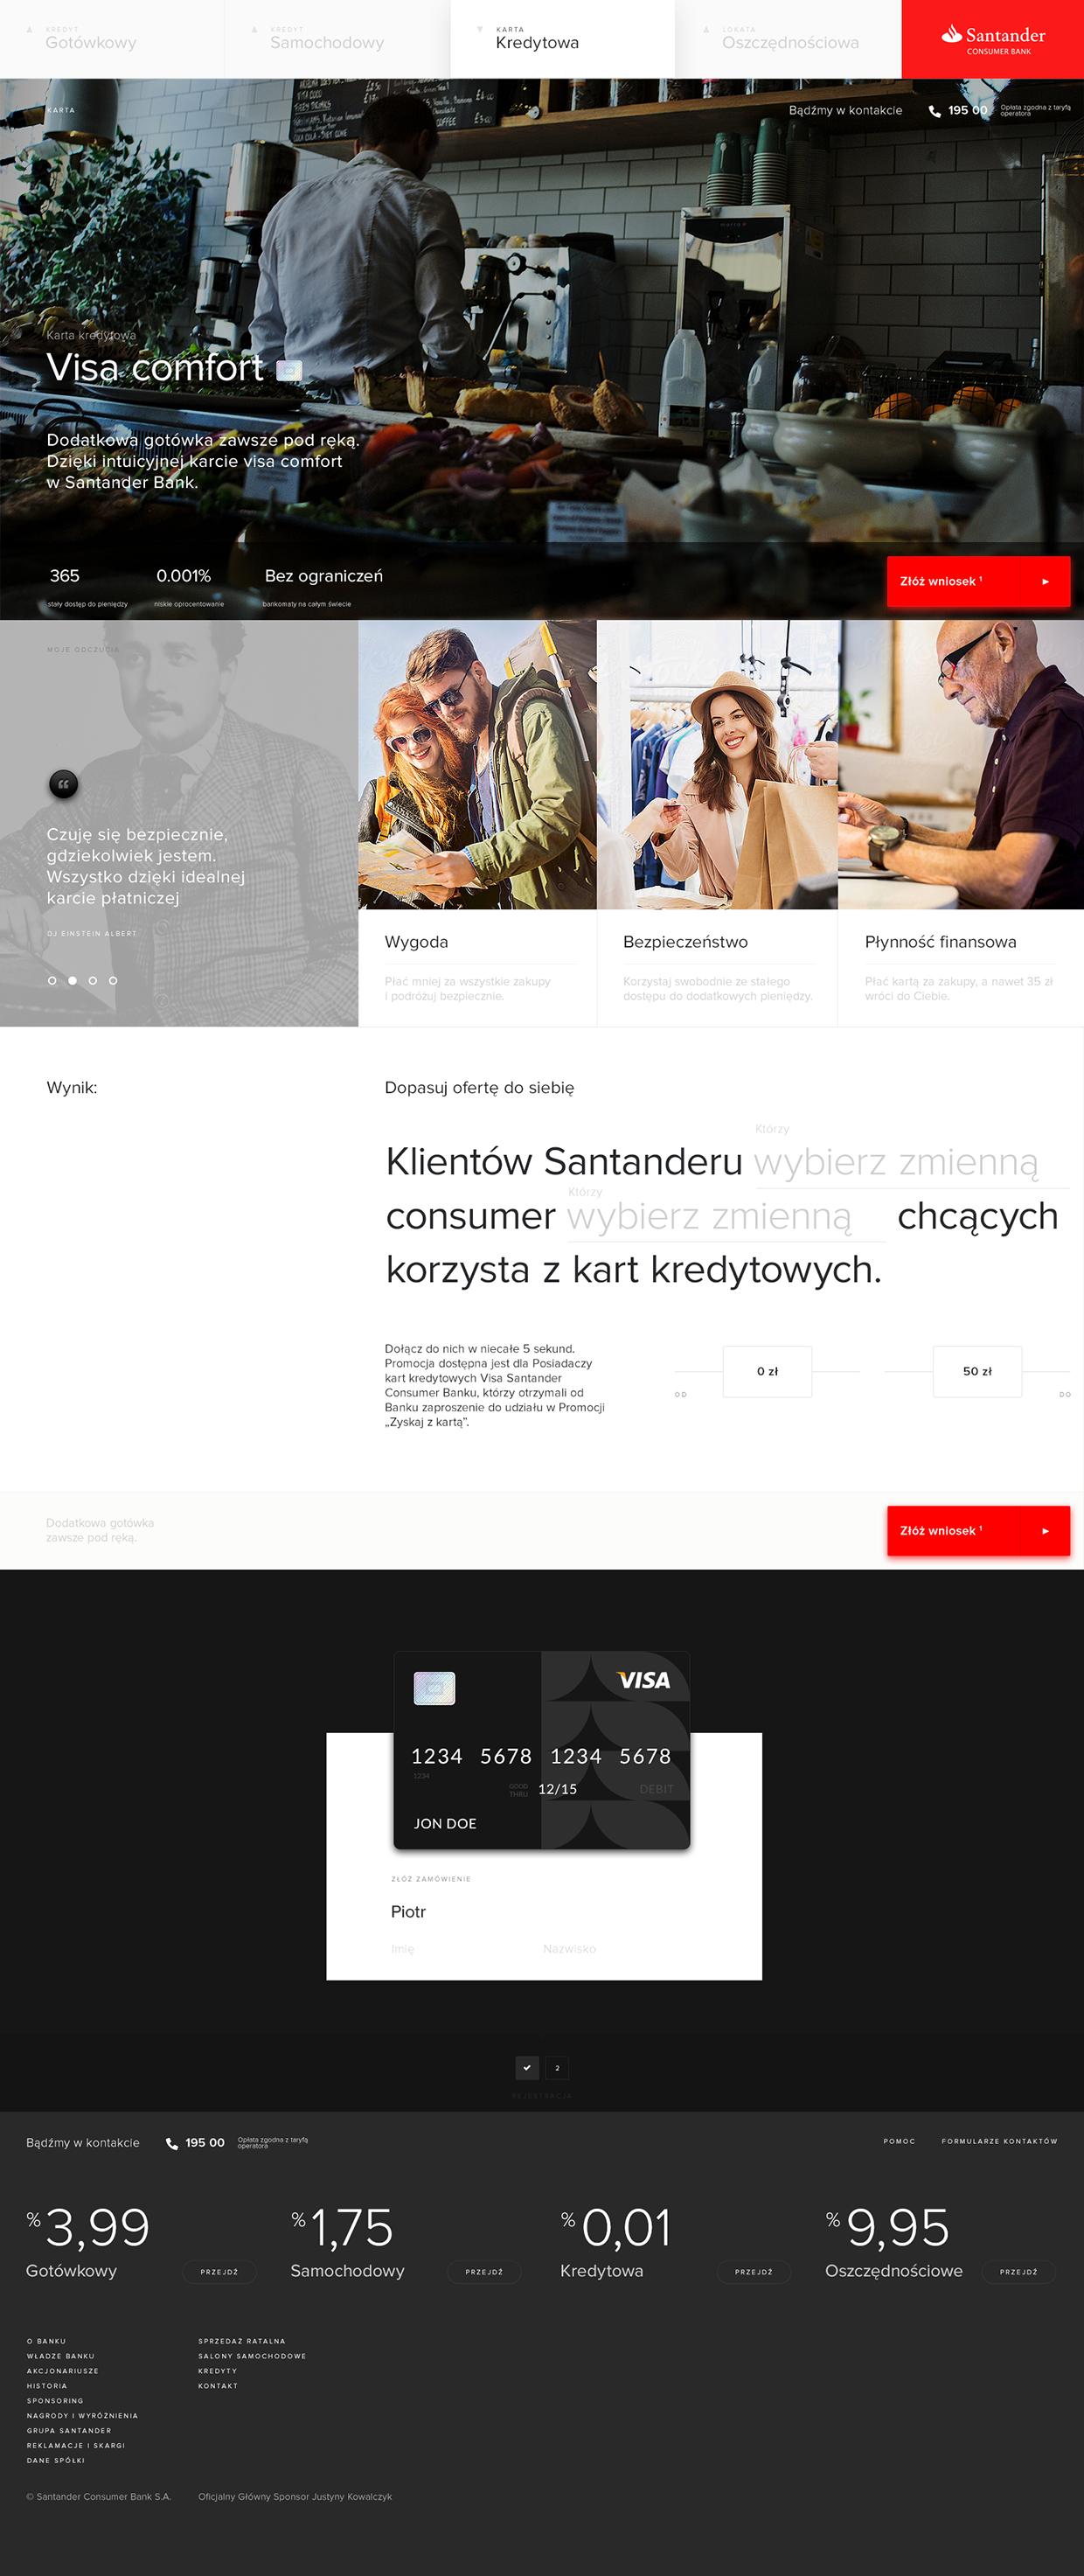 9c125440233779 5776e9149fd04 Png 1240 2946 Web Design Gallery Web Design Website Design Inspiration